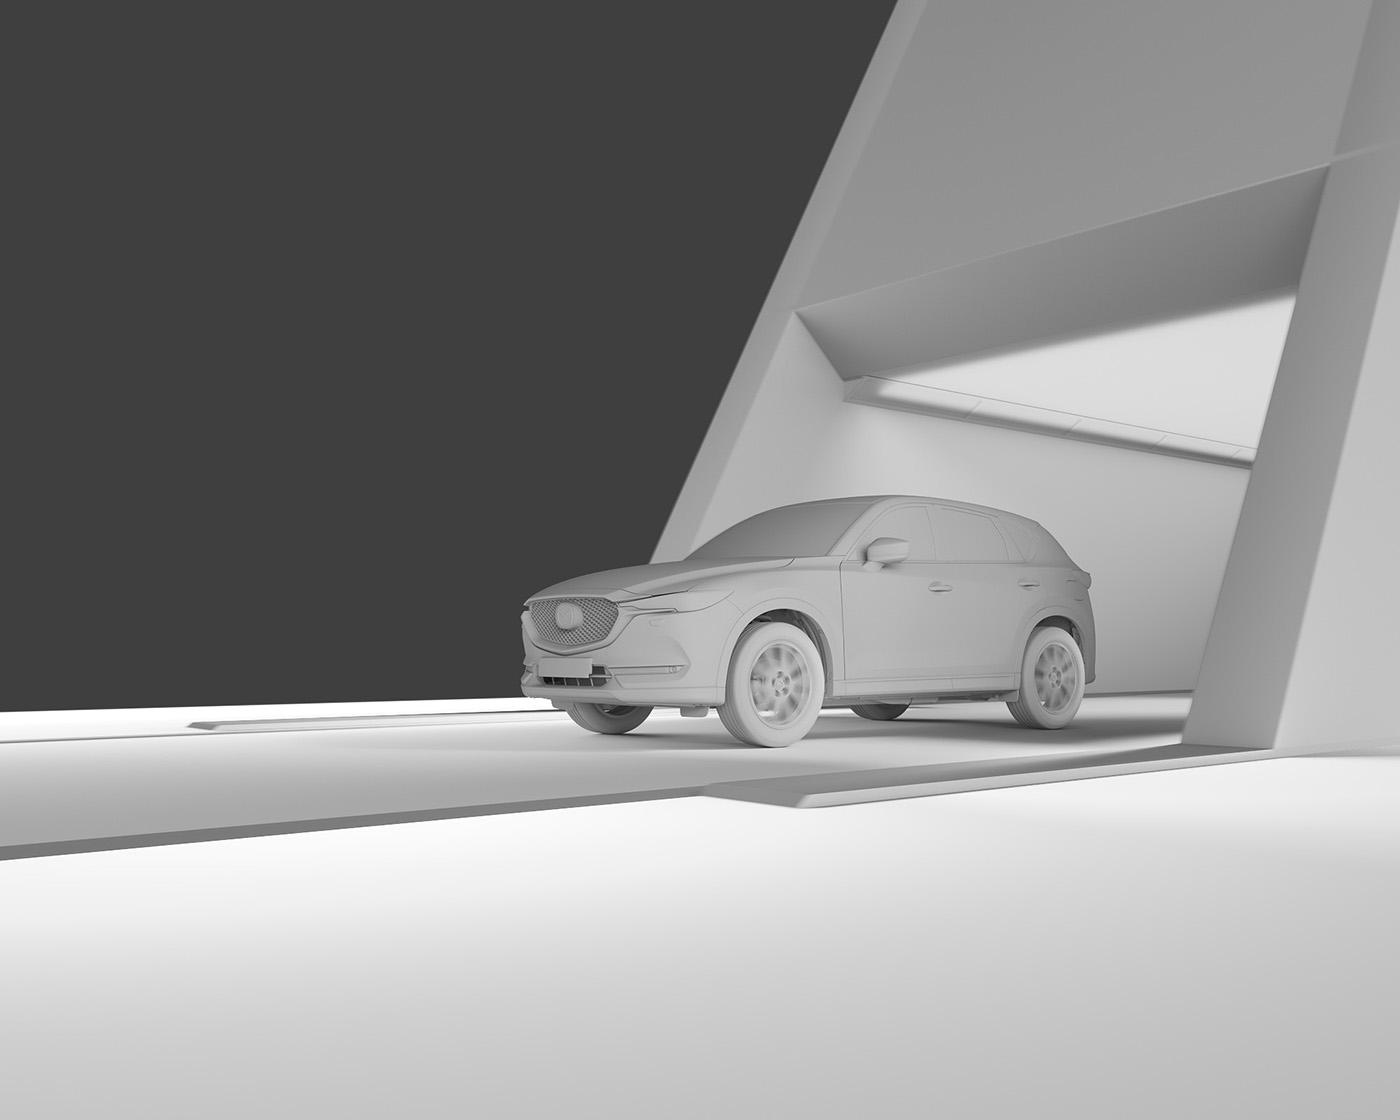 car mazda cx-5 3D postproduction CGI Render